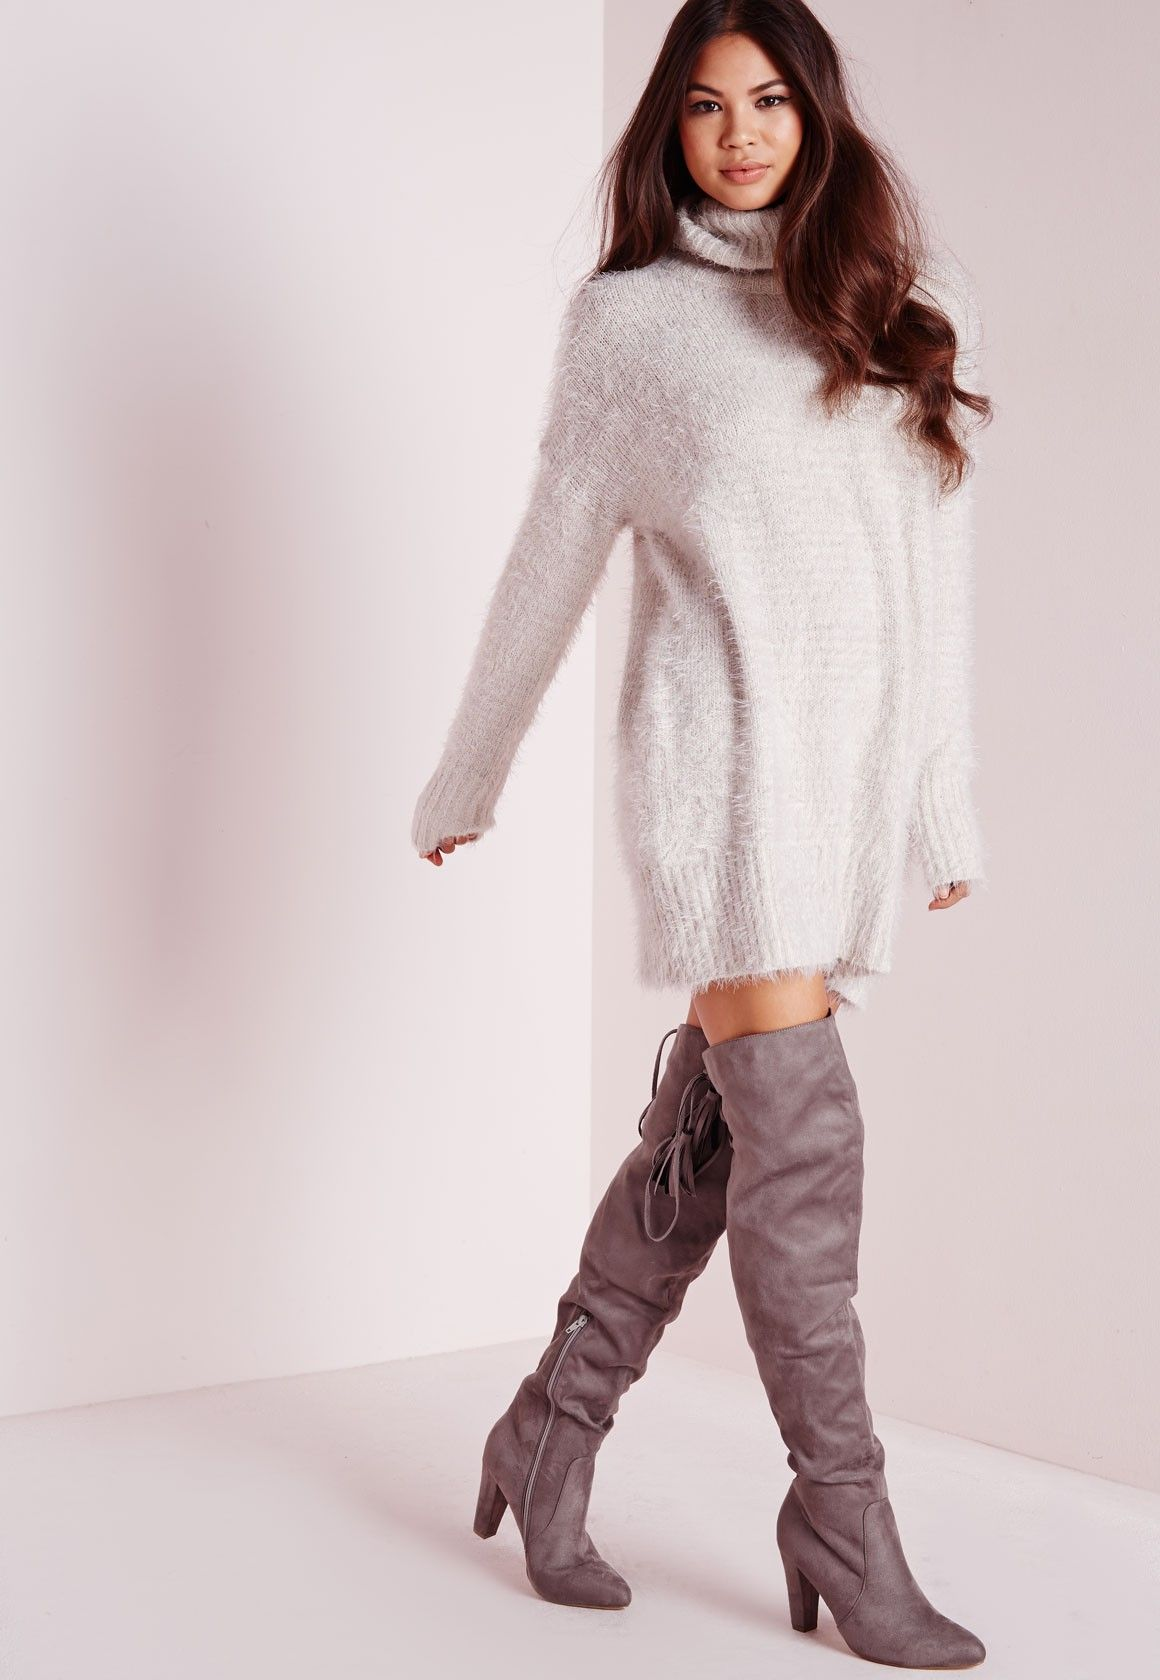 3e8405e0665 Robe-pull en laine poilue grise col roulé - Tricots - Robes-pull -  Missguided